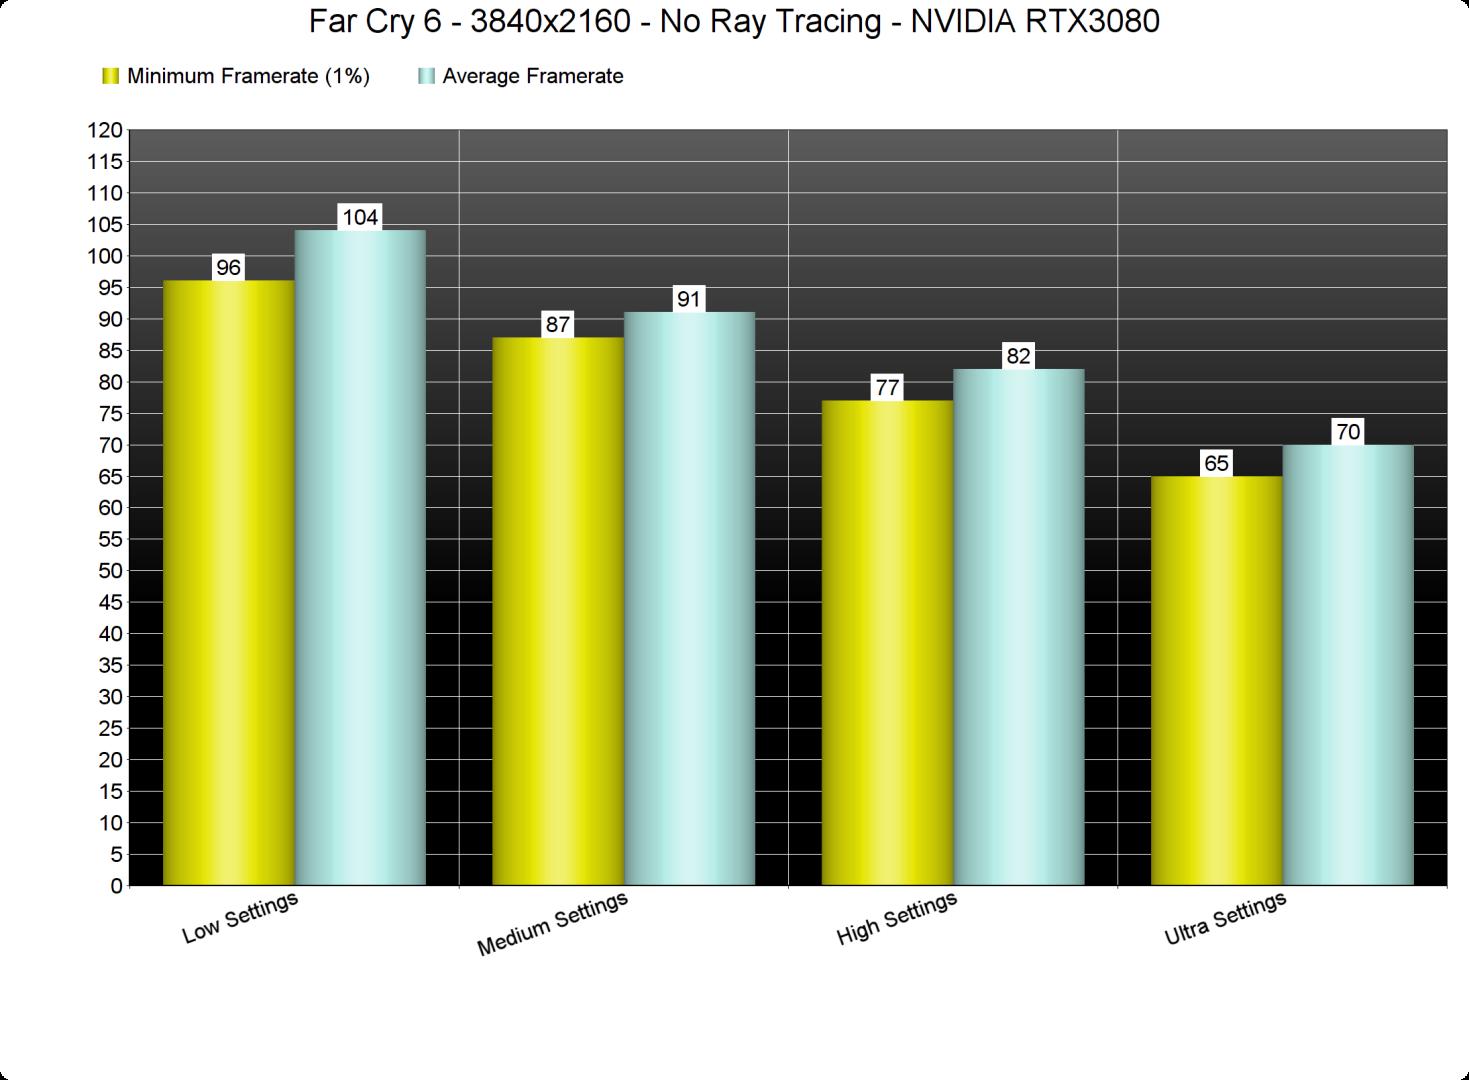 Far Cry 6 settings benchmarks